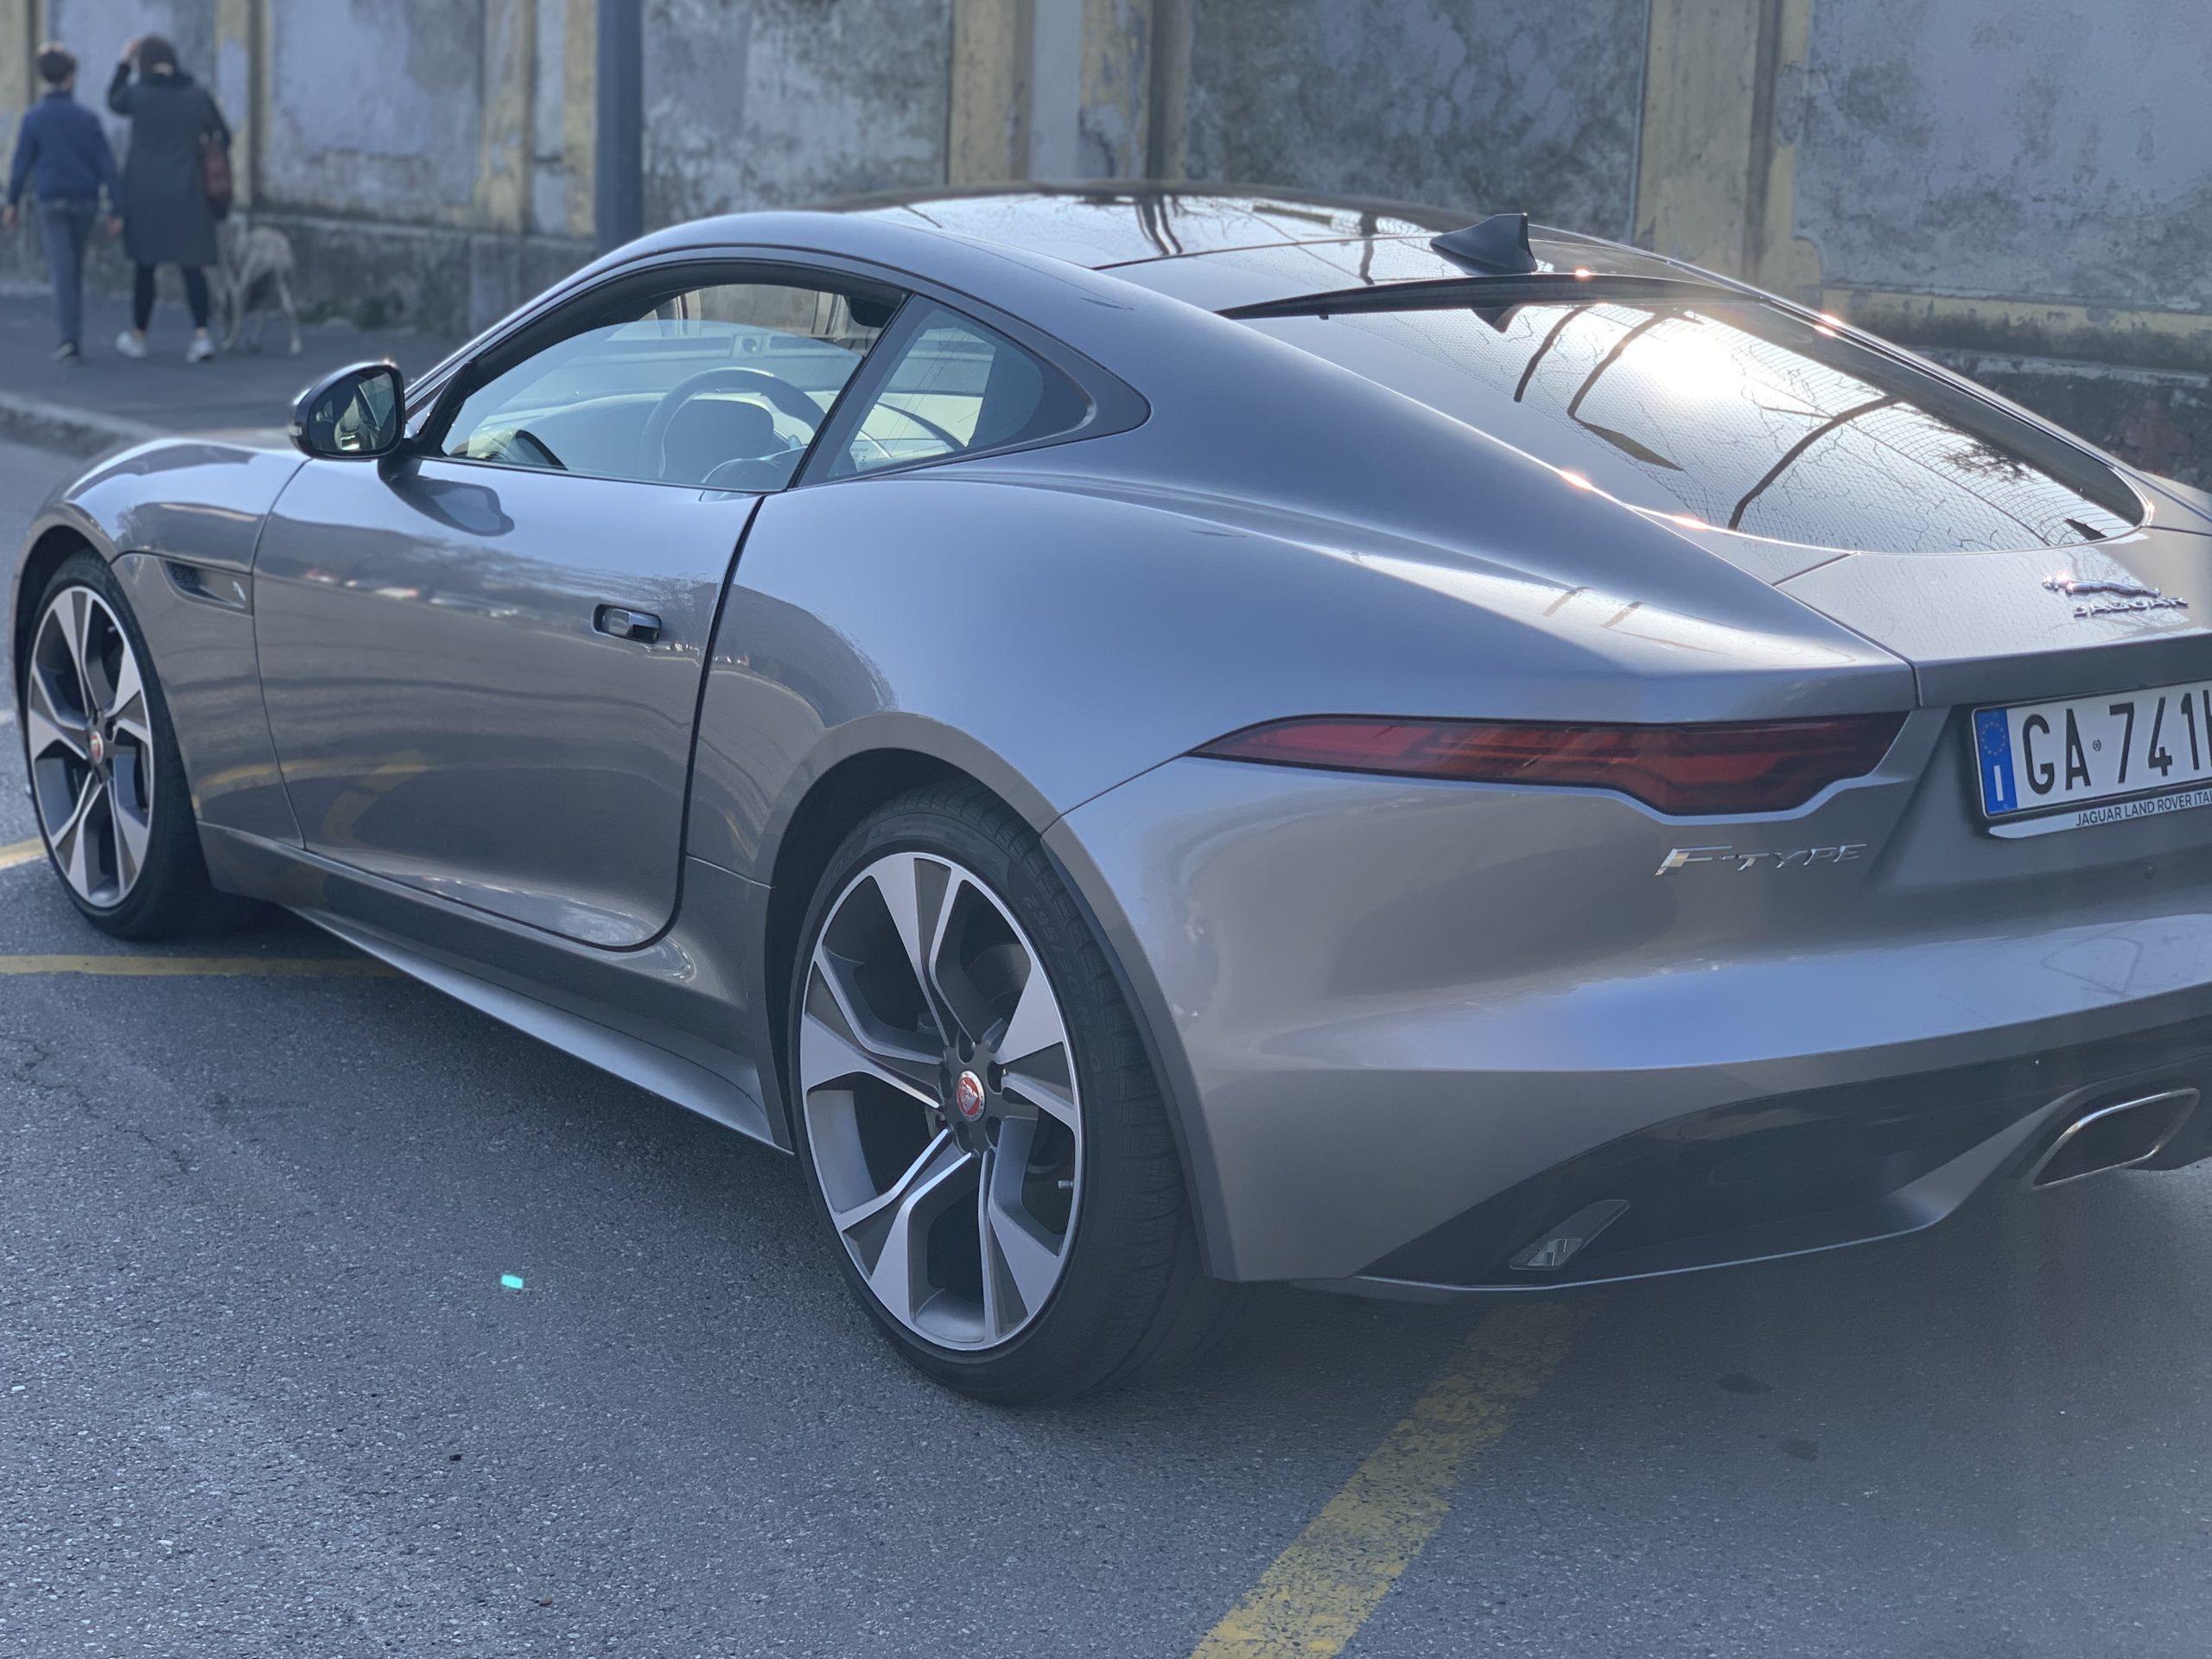 jaguar velenosi